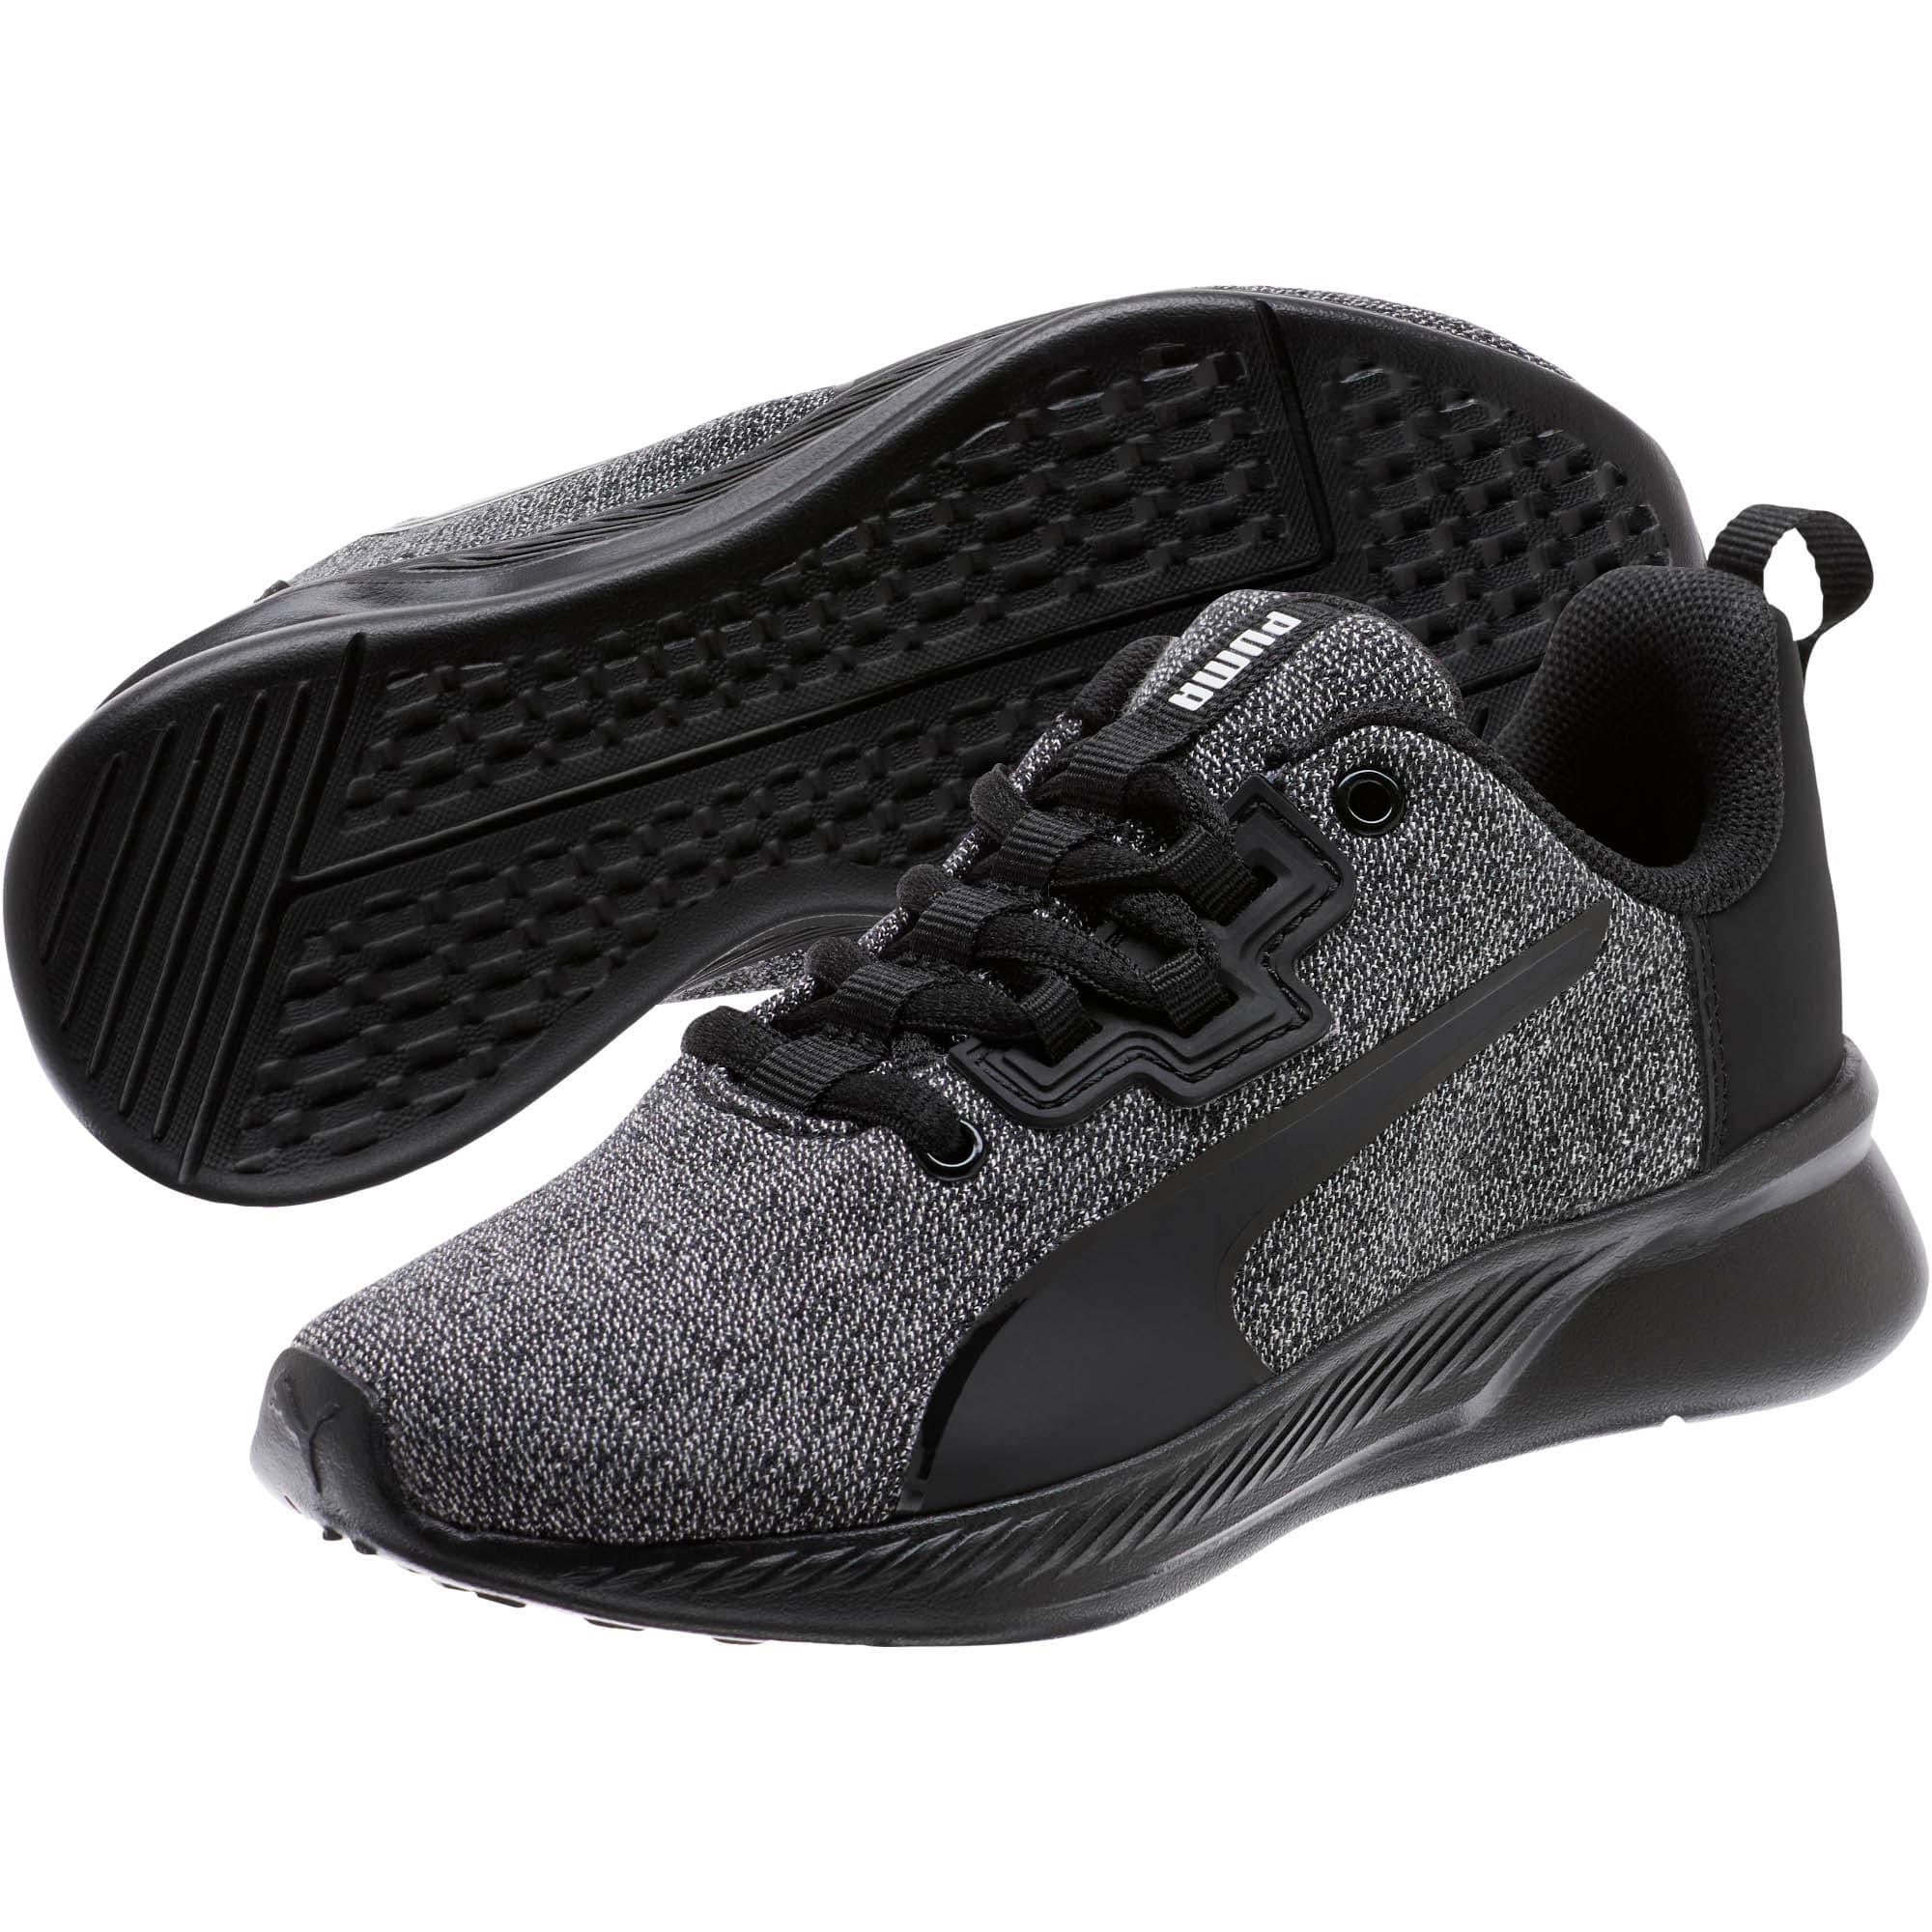 Thumbnail 2 of Tishatsu Runner Knit Little Kids' Shoes, Puma Black-Puma White, medium